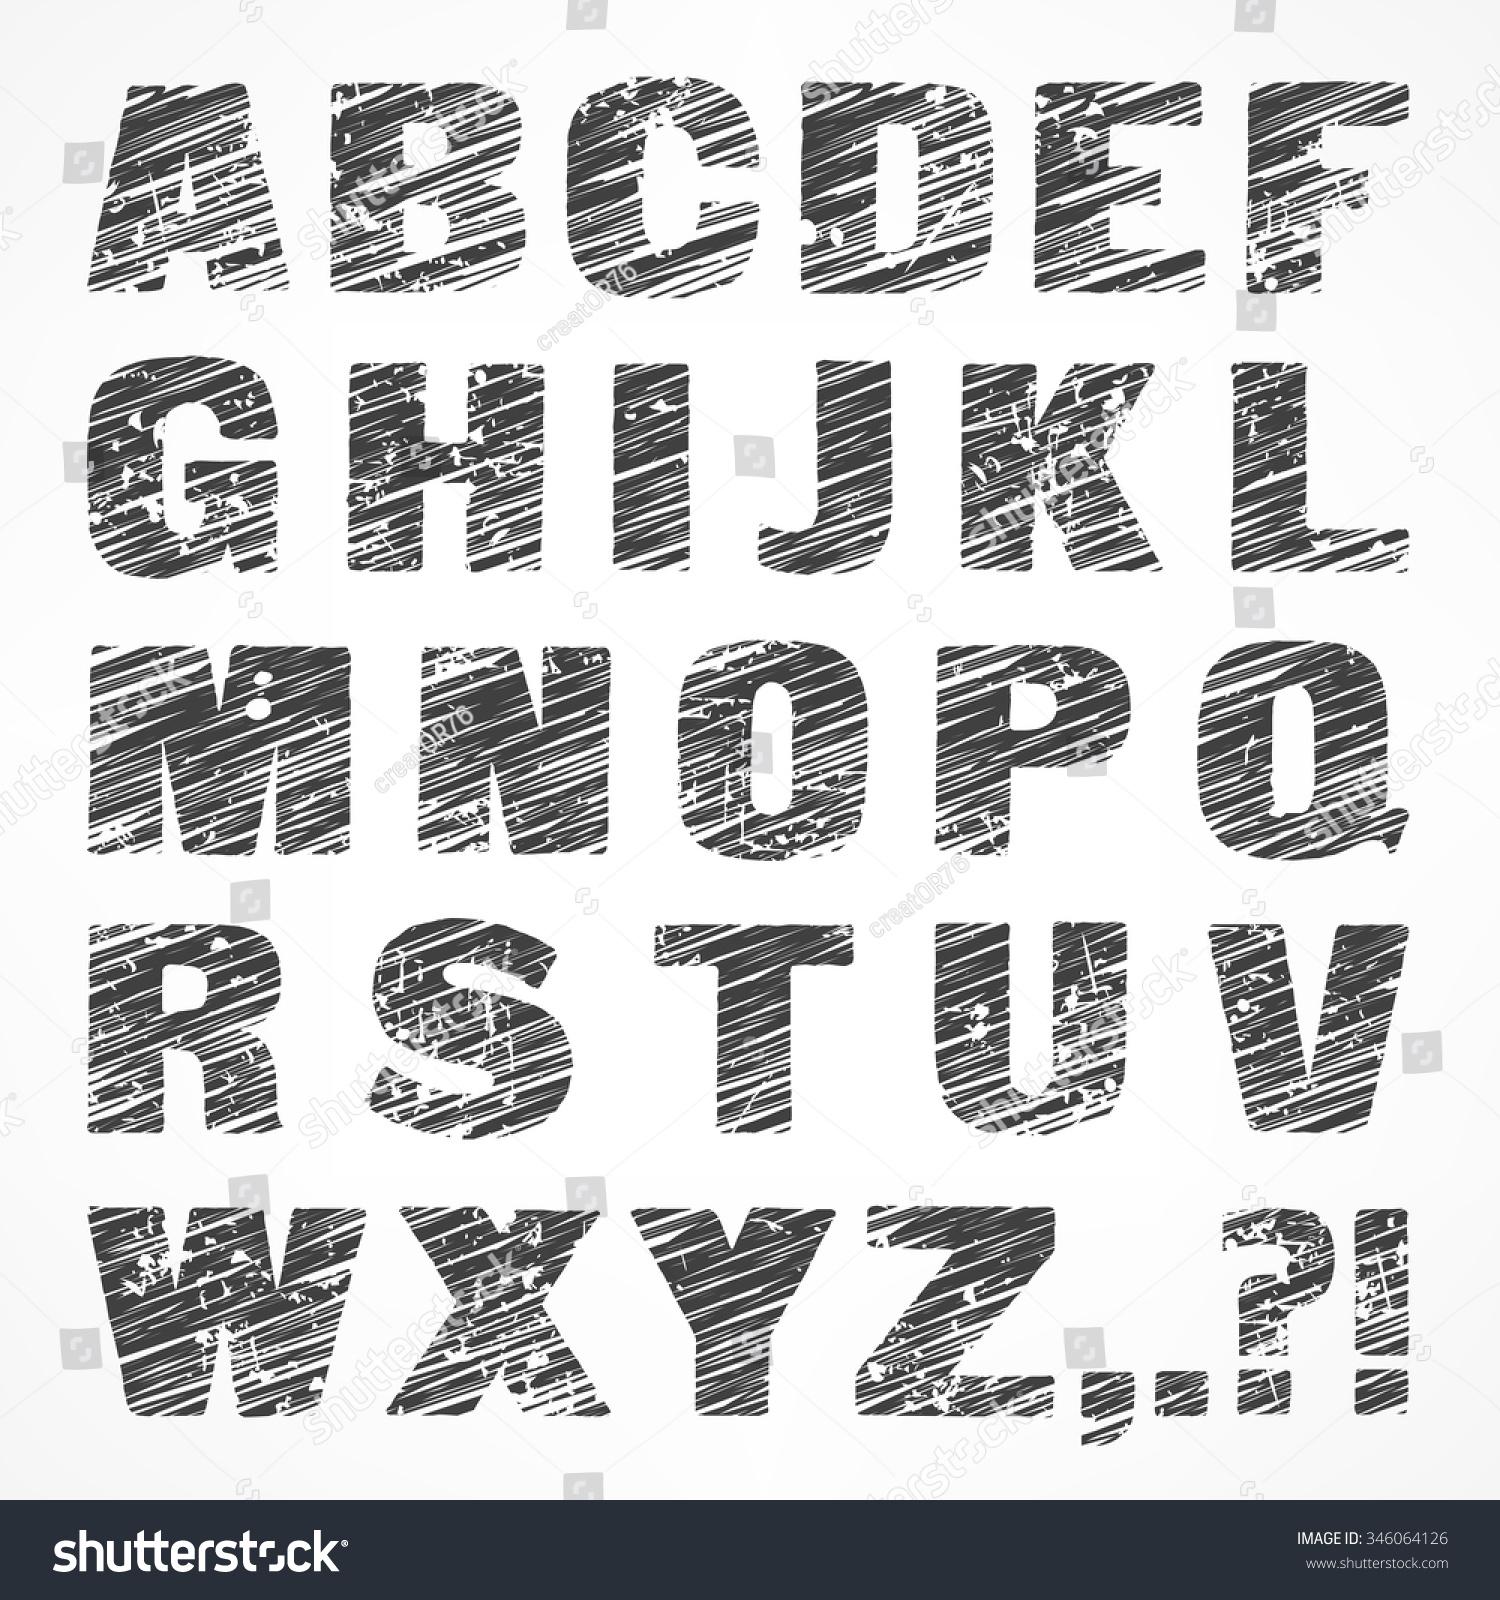 Gray Alphabet Font: Alphabet Caps Sketch Letters Grey Color Stock Vector